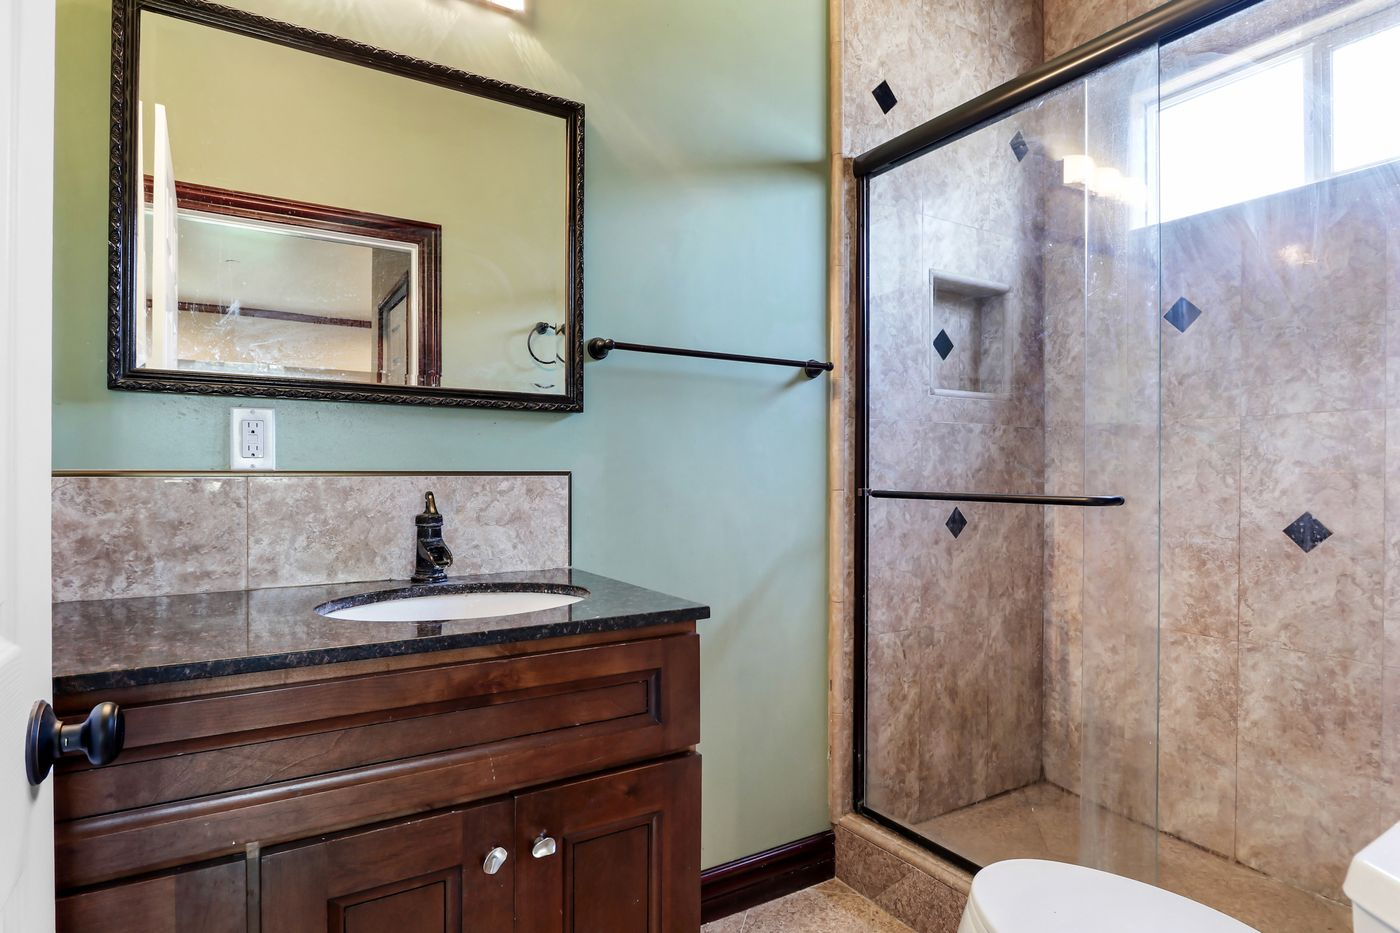 real-estate-photography-los-angeles-pasadena-glendale-burbank-AD-photographer-14